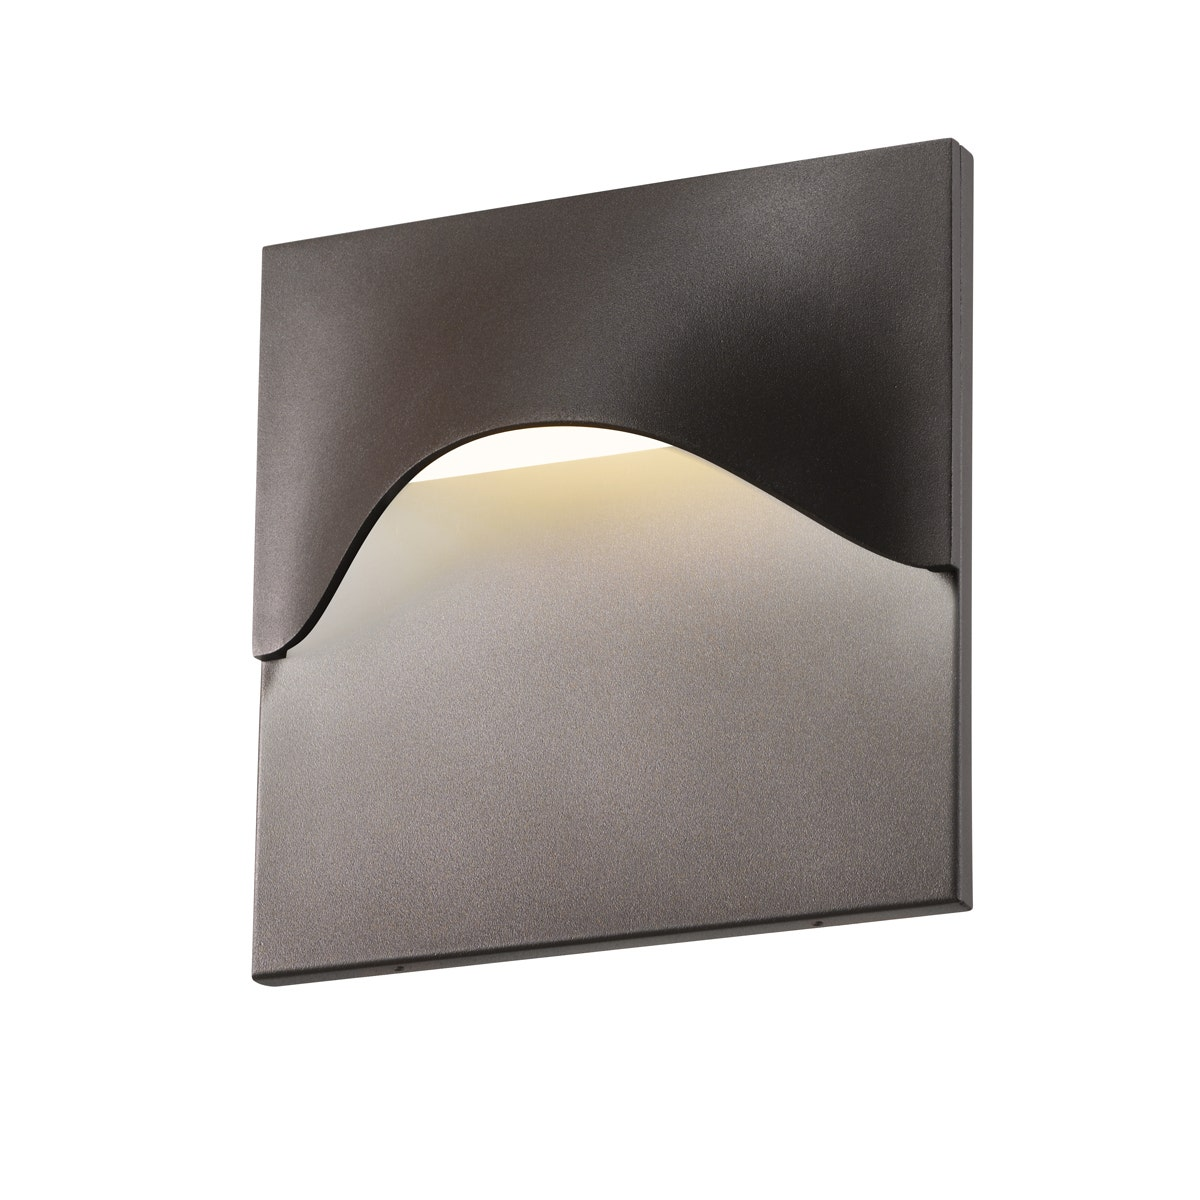 sonneman Tides High LED Sconce entry